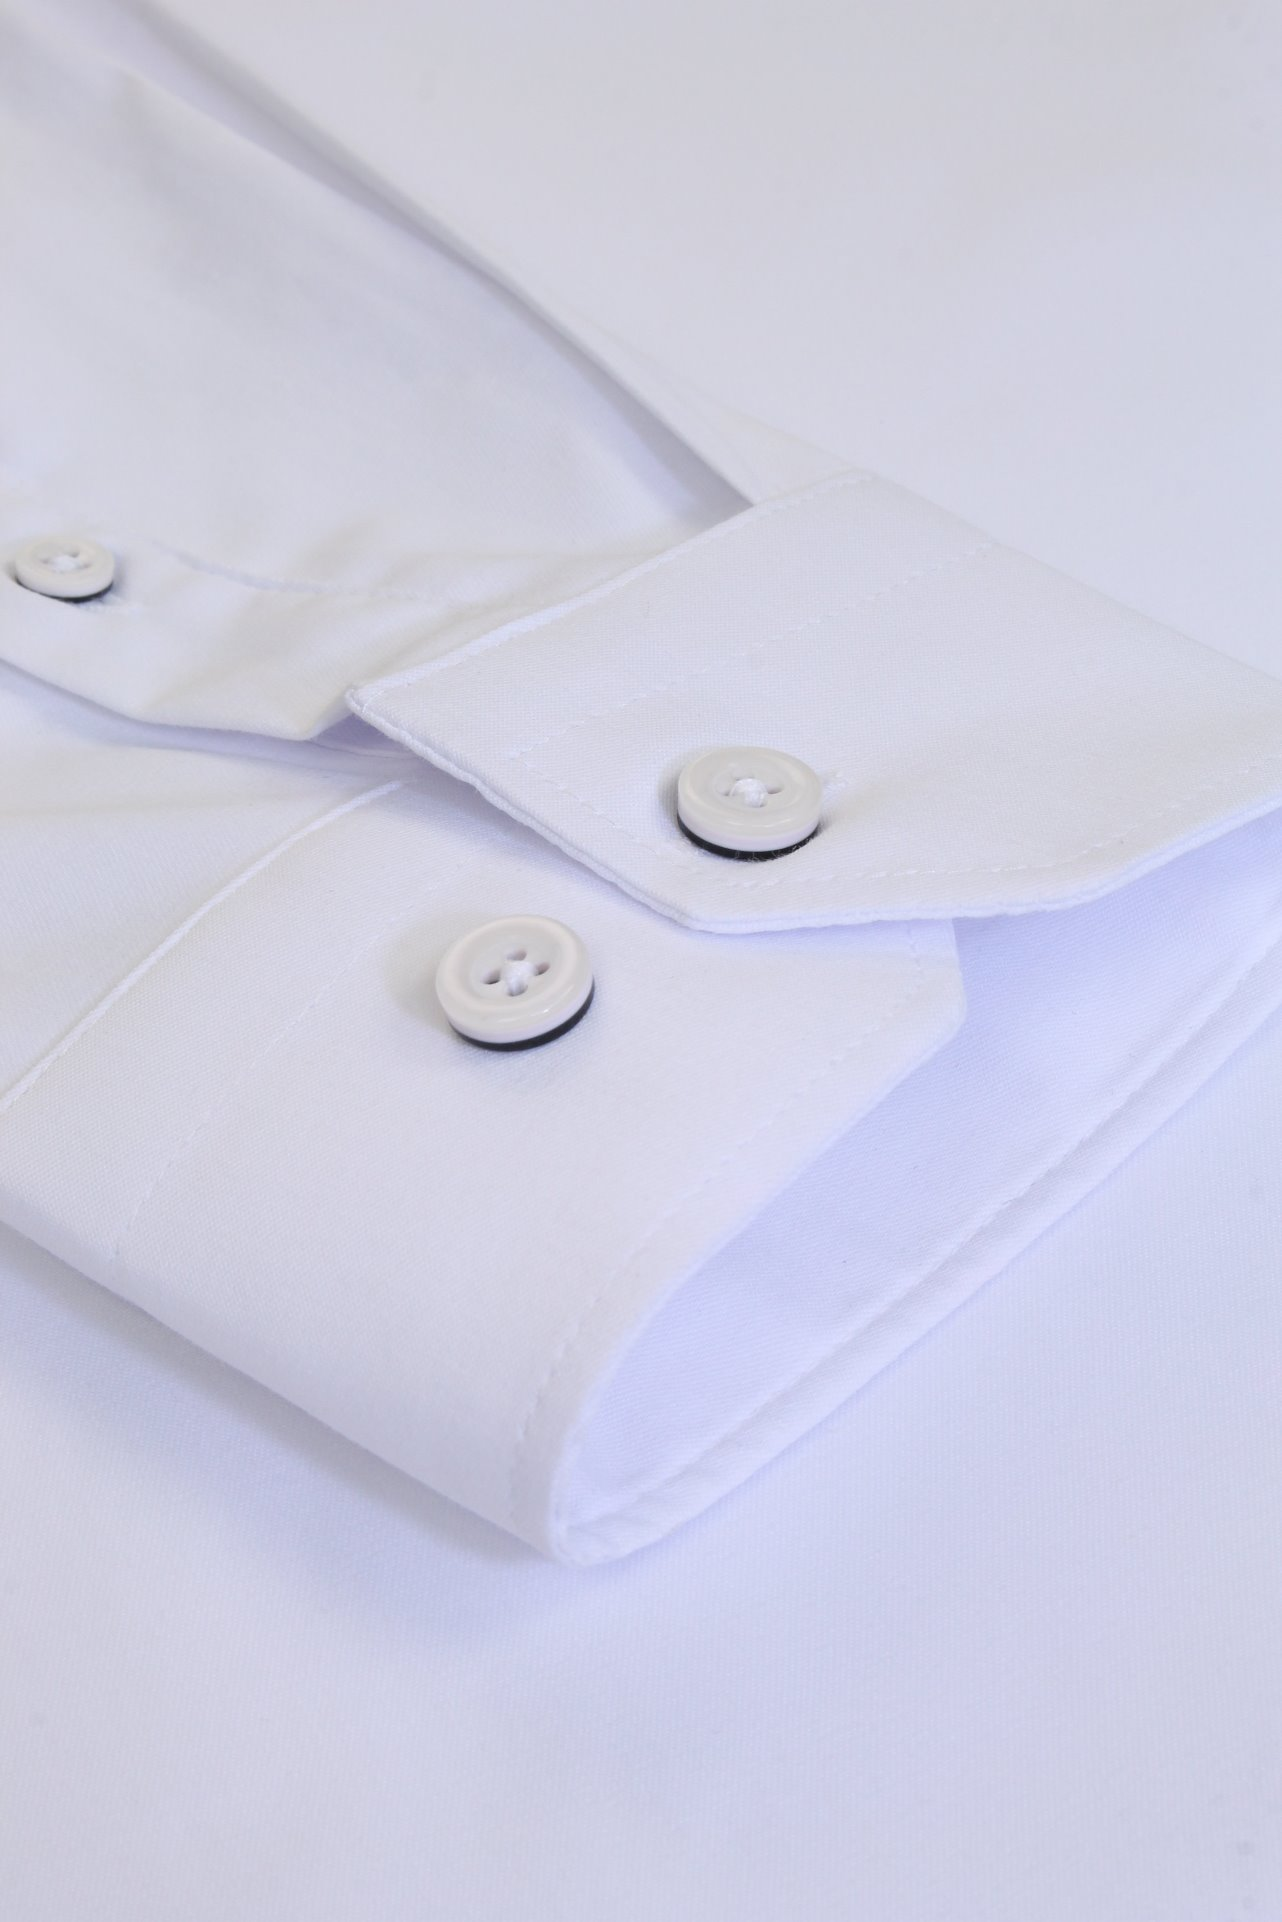 Xact-Mens-Long-Sleeved-Poplin-Stretch-Shirt-Slim-Fit miniatuur 16